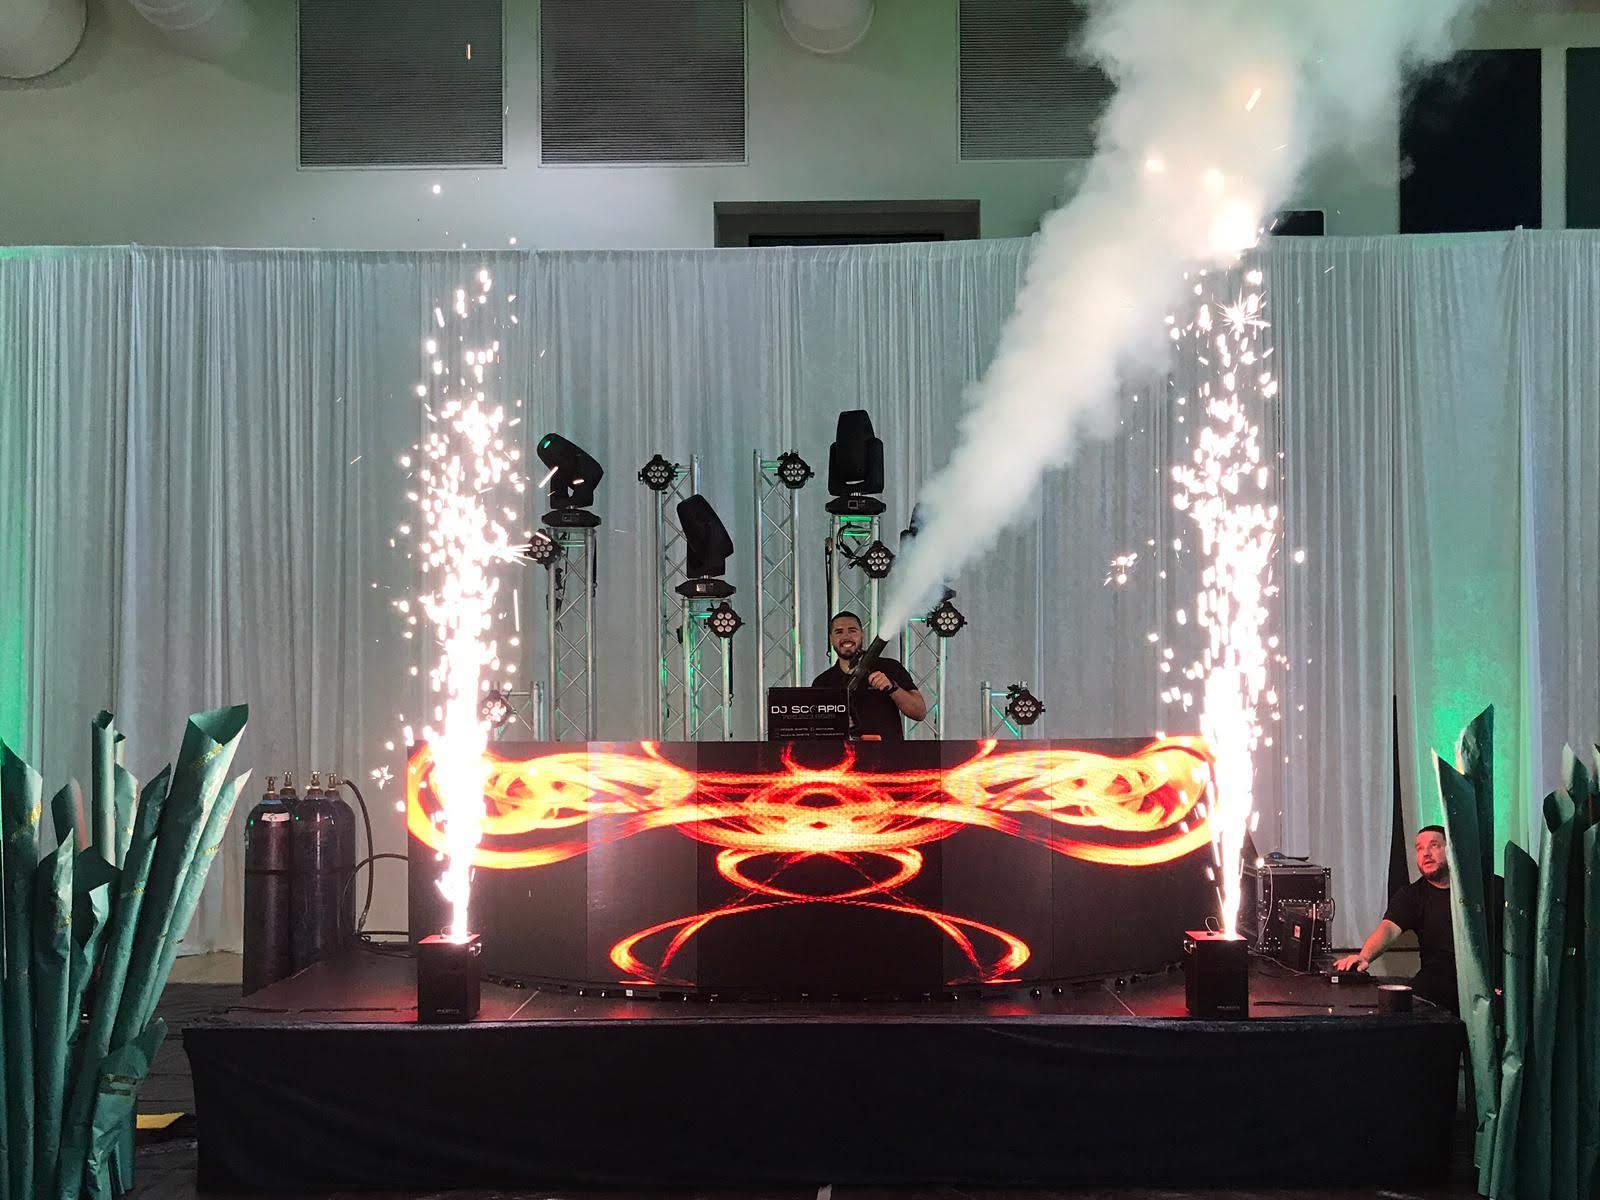 Cold Spark Fountain DJ Set Up Co2